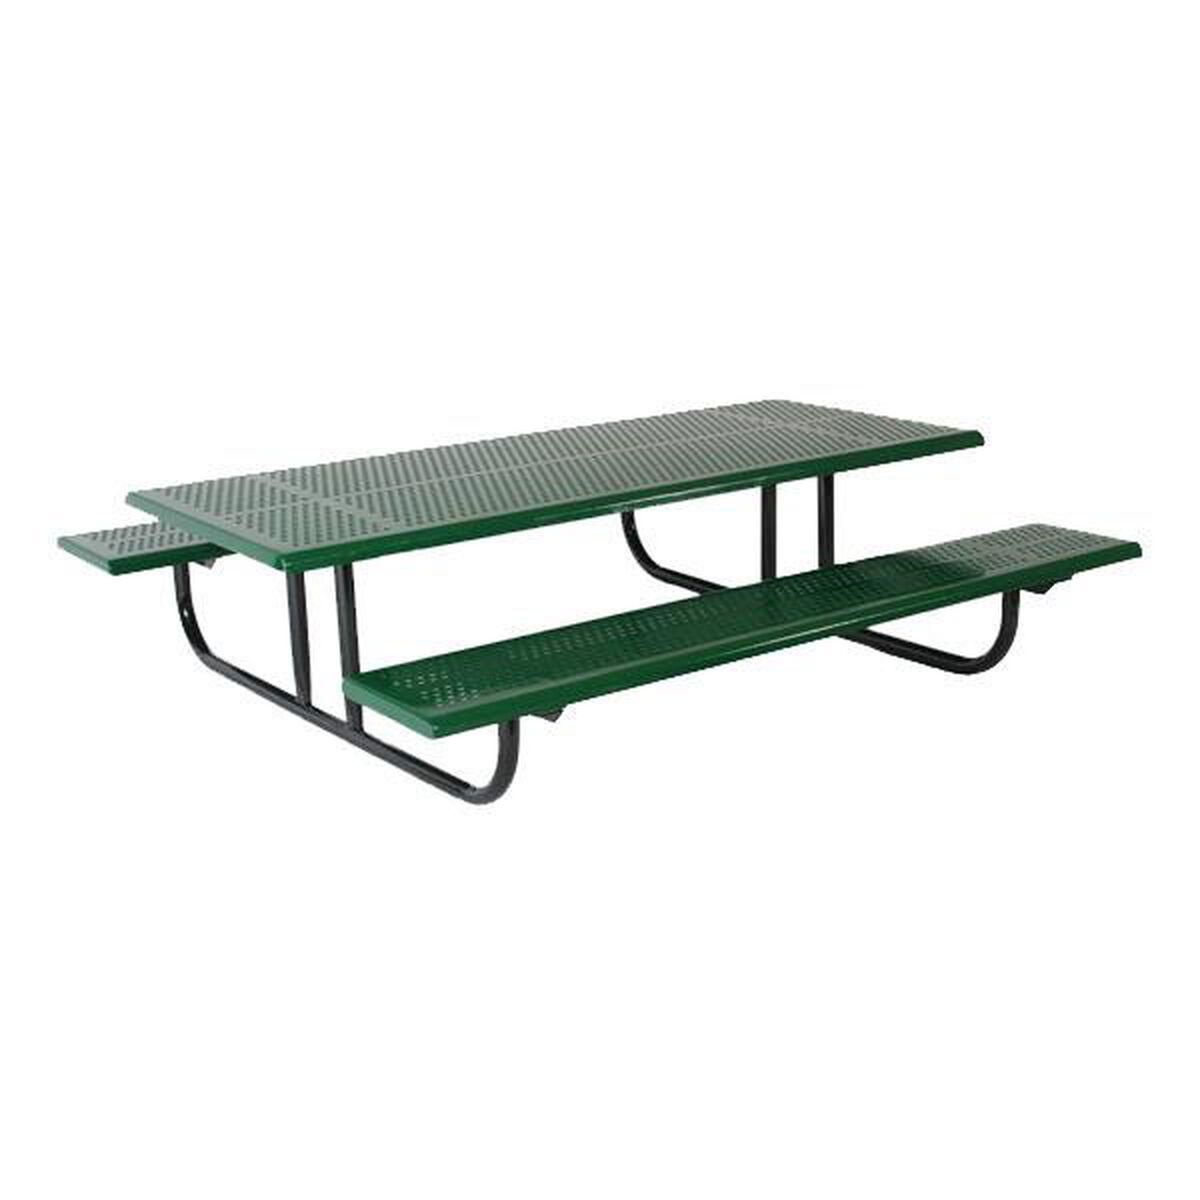 Rectangle Preschool Picnic Table RestaurantFurnitureLesscom - Picnic table legs for sale